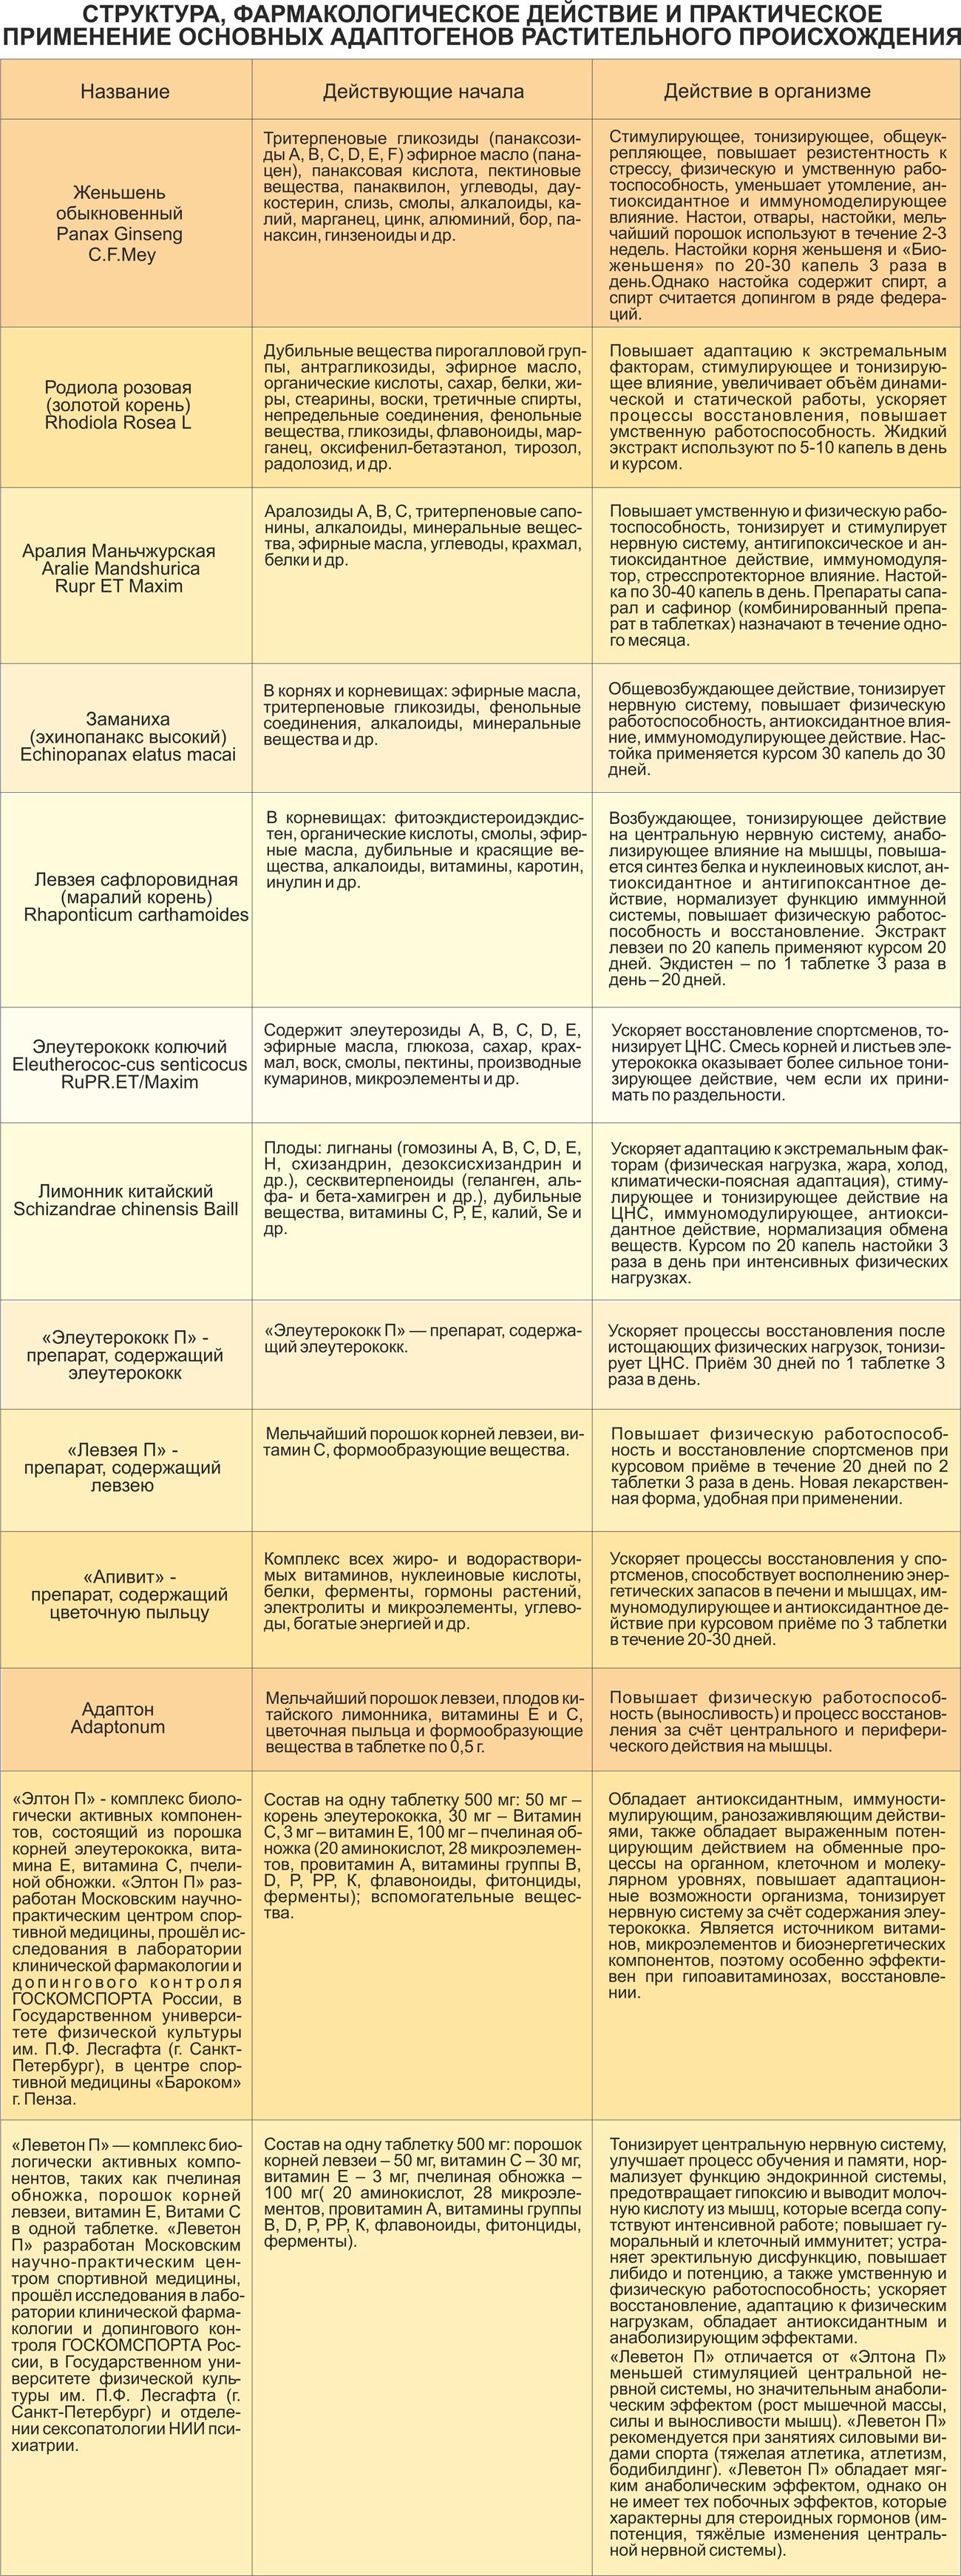 lekarstva i bad v sporte 1